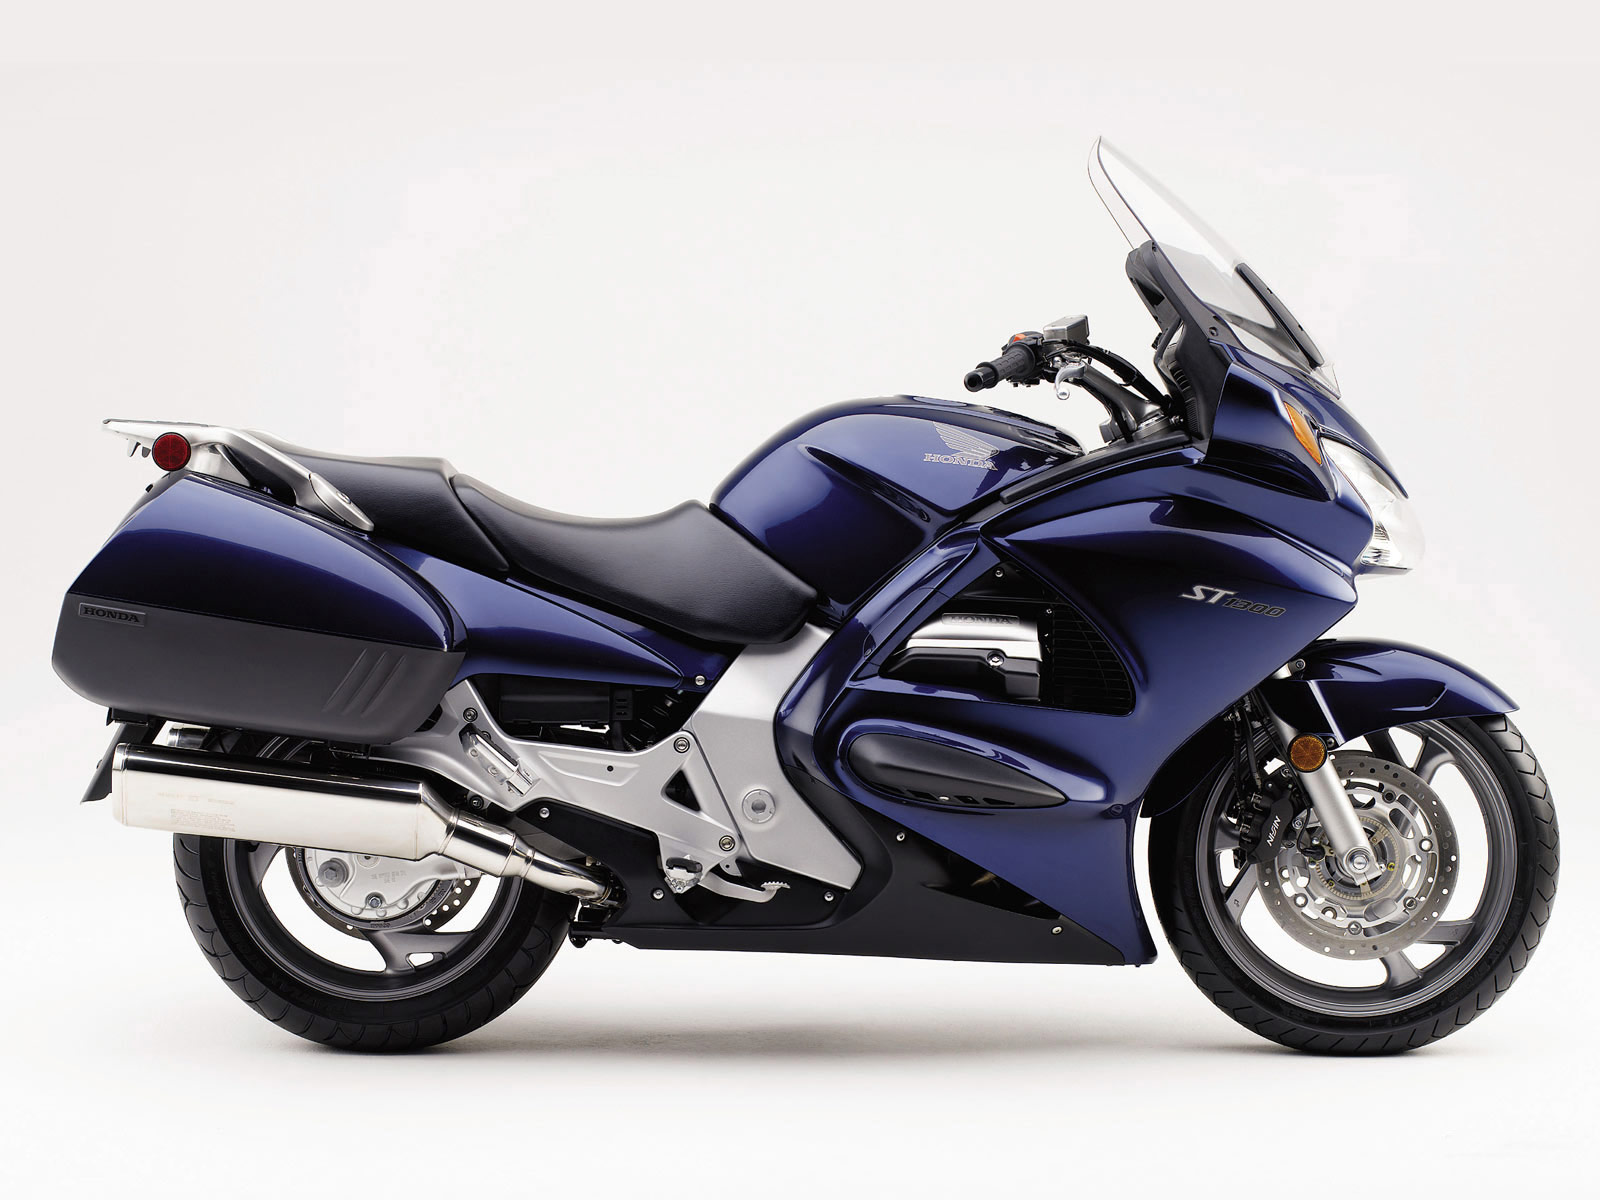 Honda ST1300 2004 1 Motorcyle wallpapers